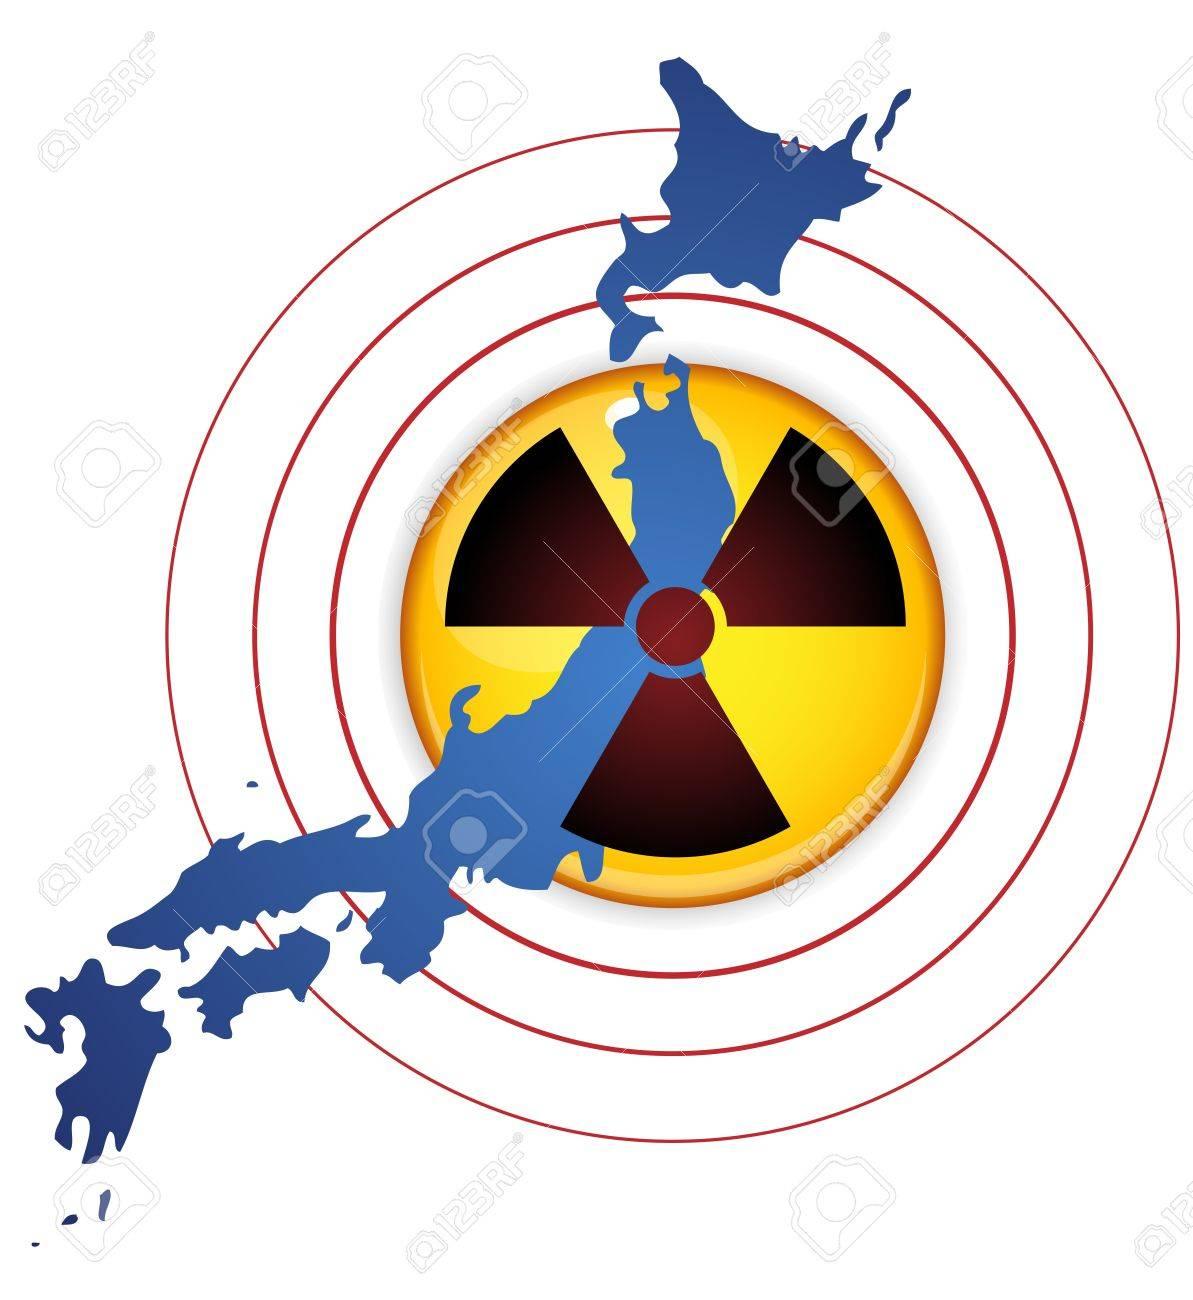 Japan Earthquake, Tsunami and Nuclear Disaster 2011 Stock Vector - 9227936